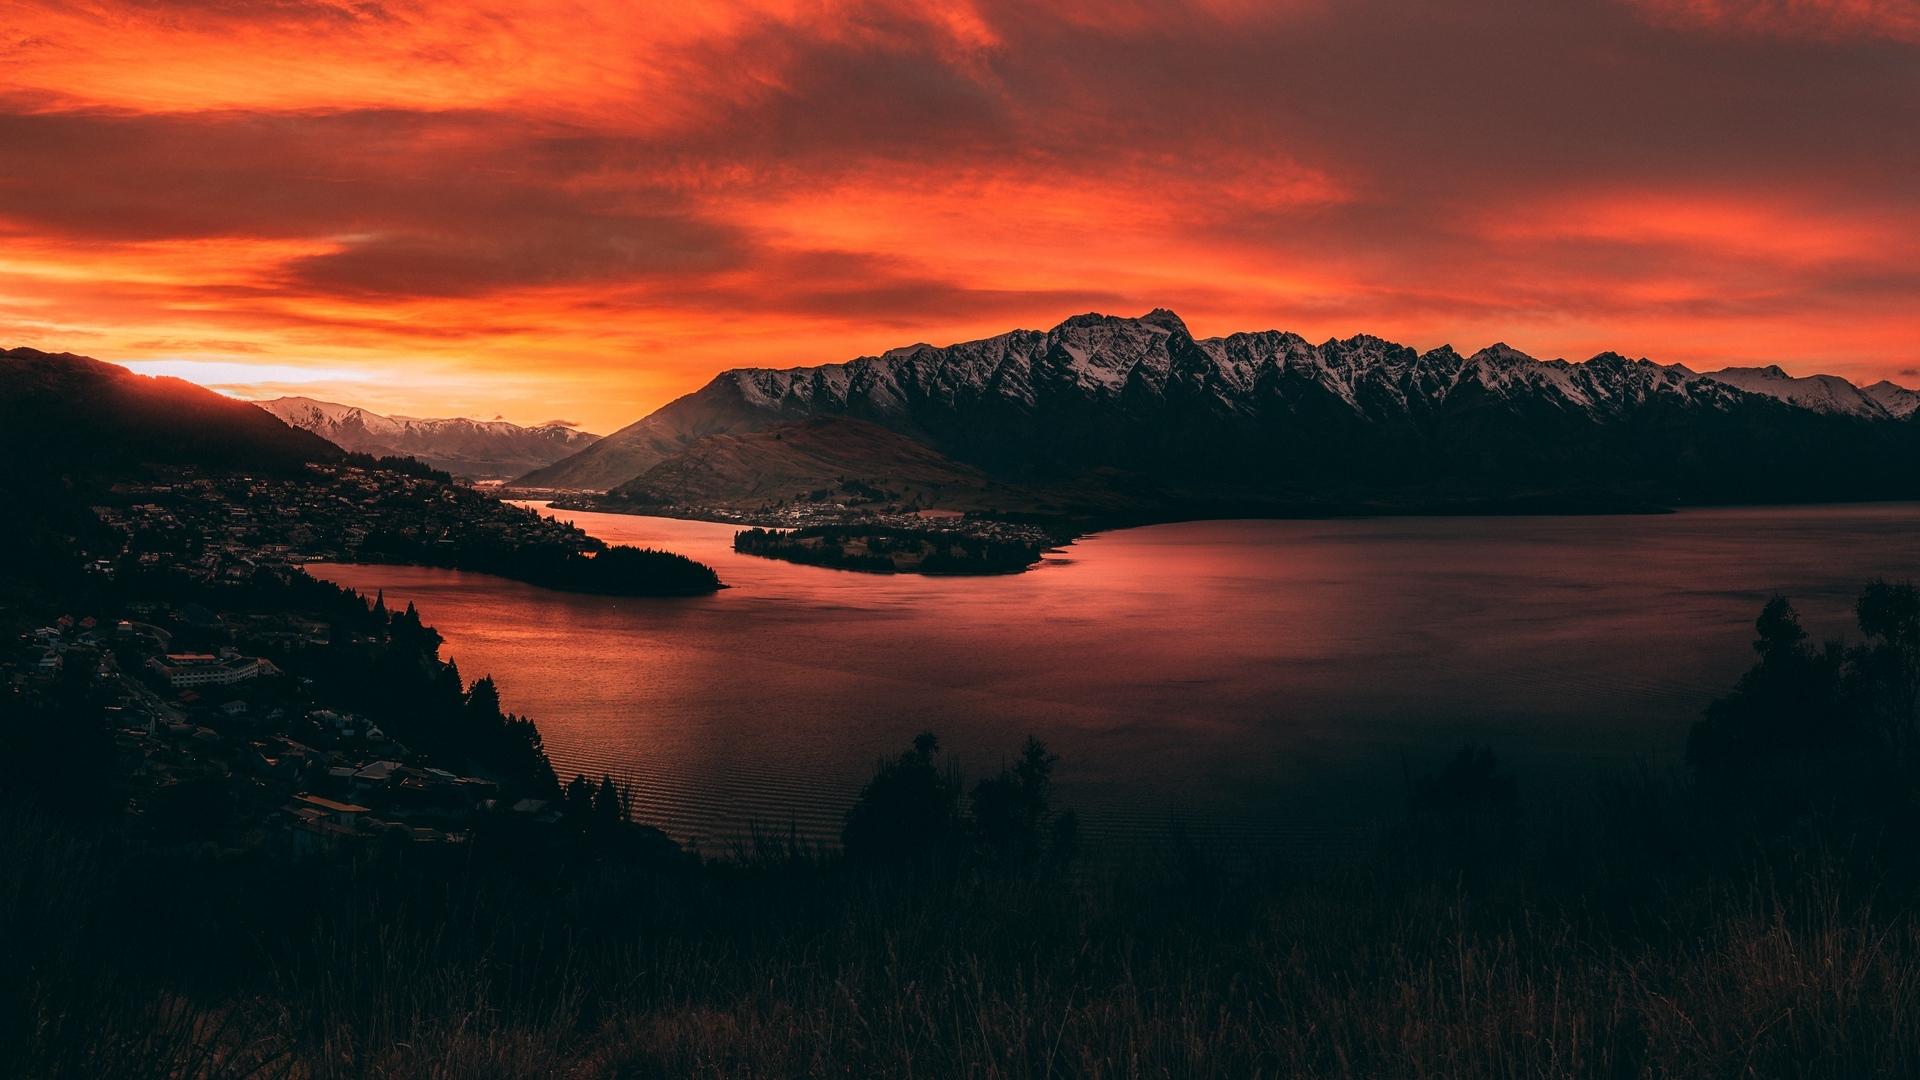 1920x1080 New Zealand Orange Mountain Sunset 1080p Laptop